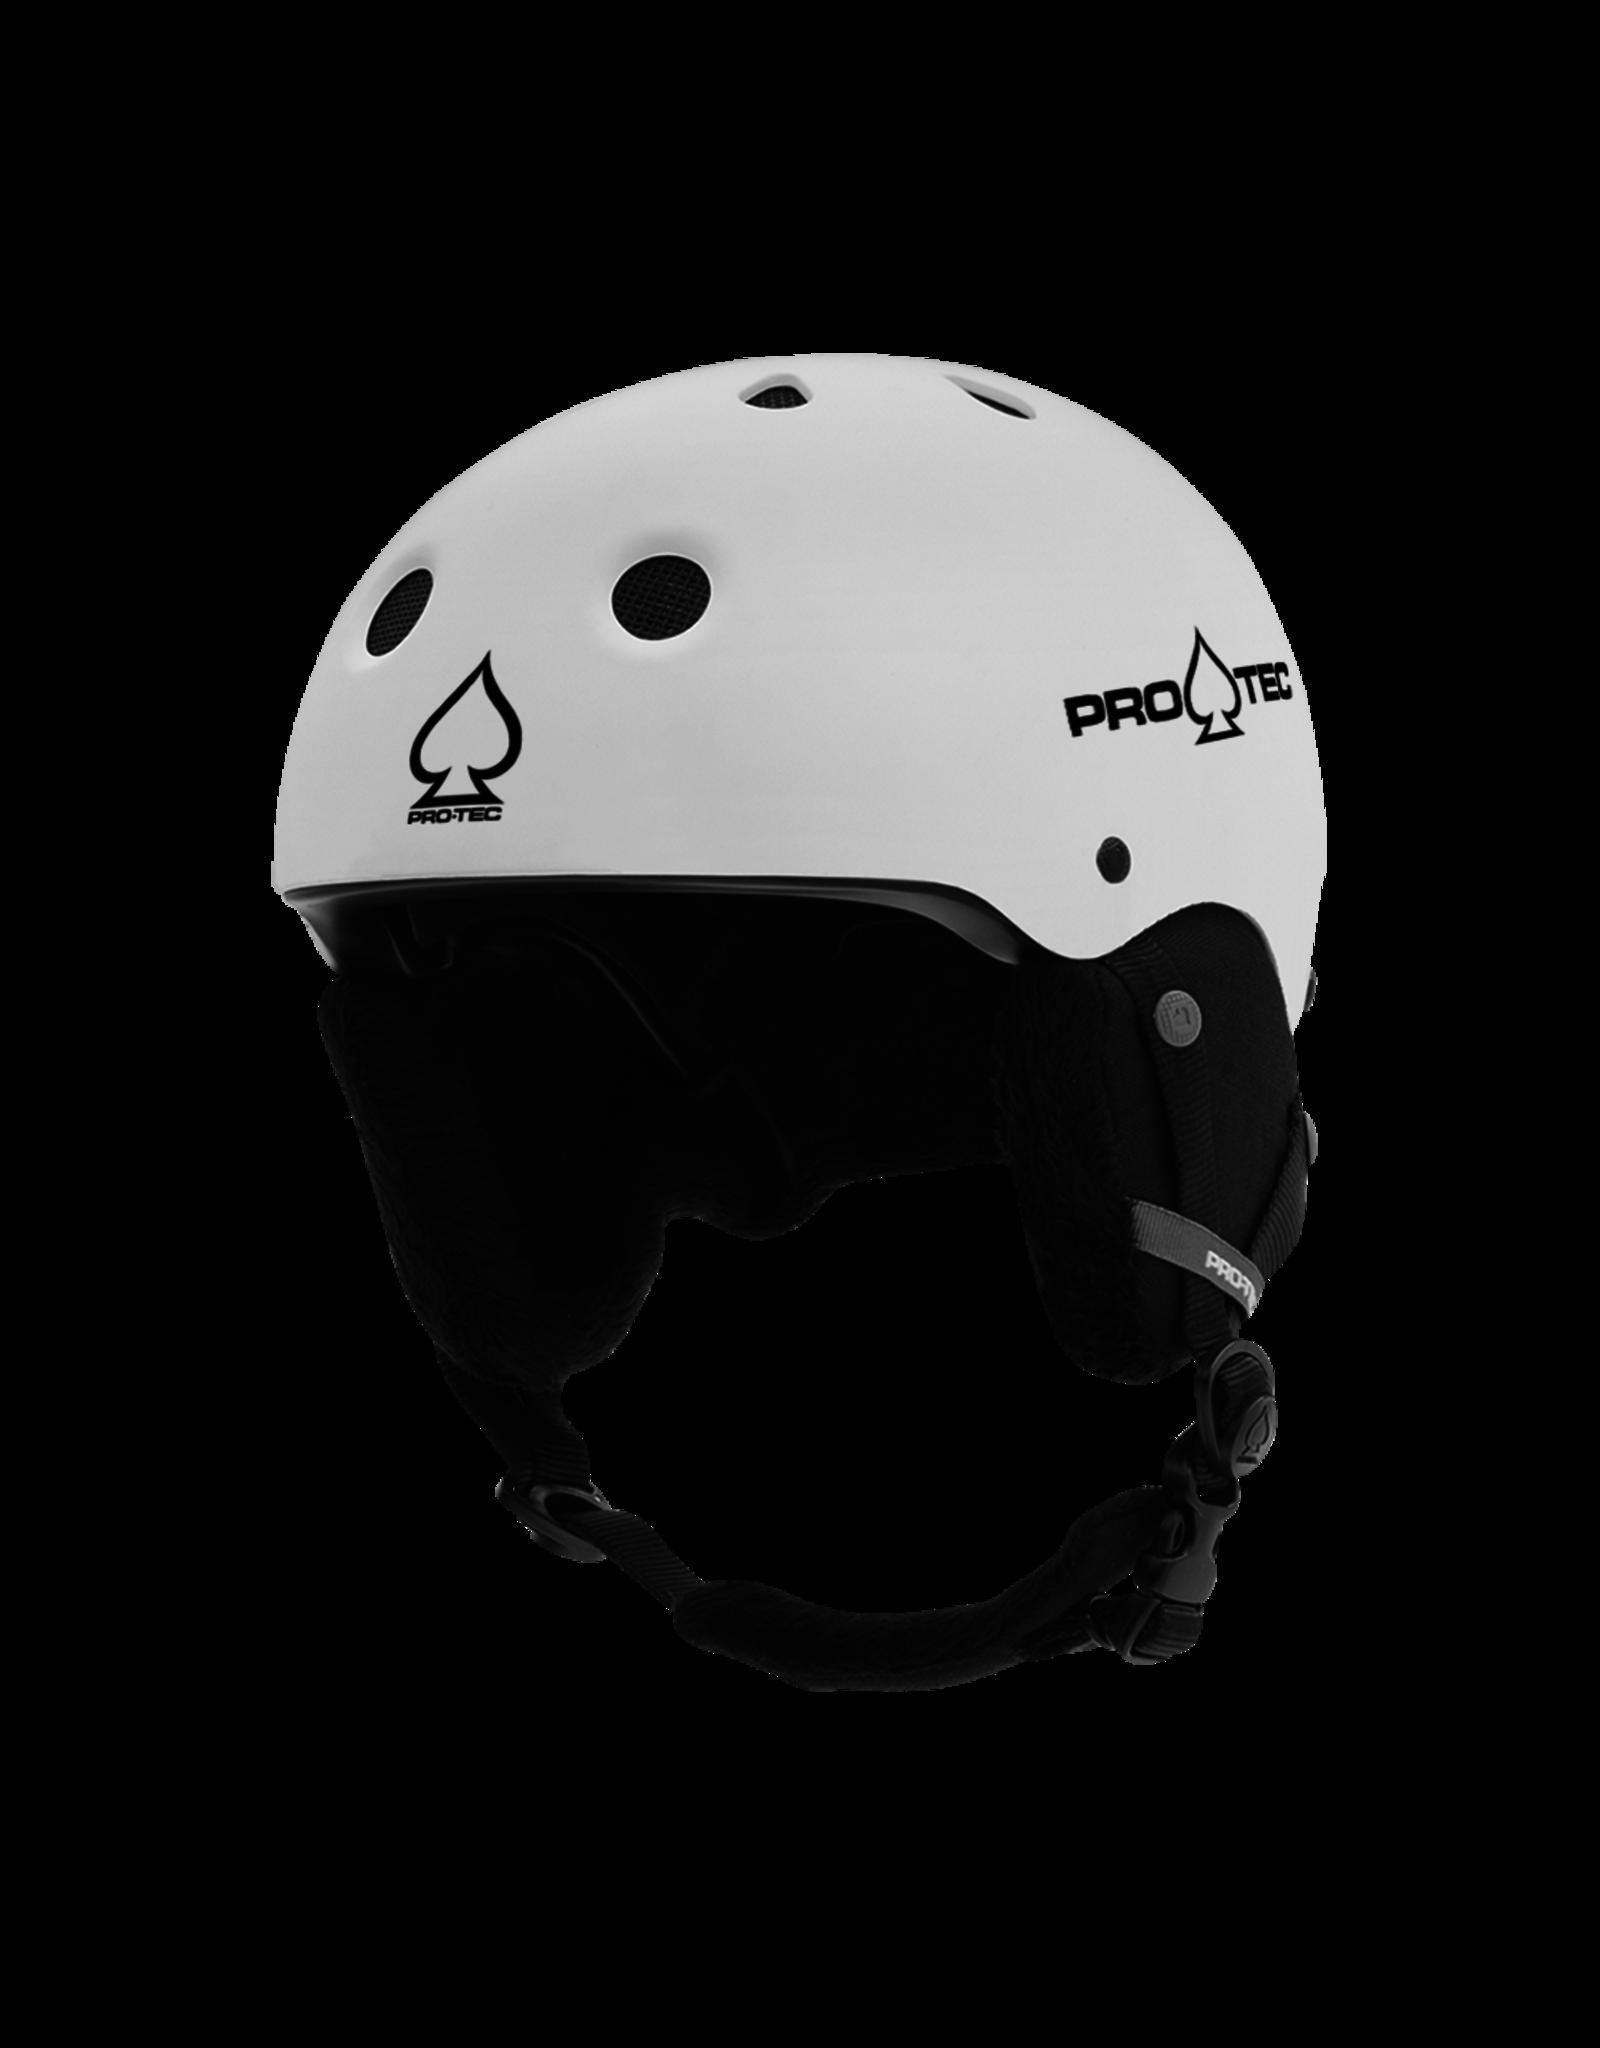 PRO-TEC PROTEC - CLASSIC SNOW WHITE